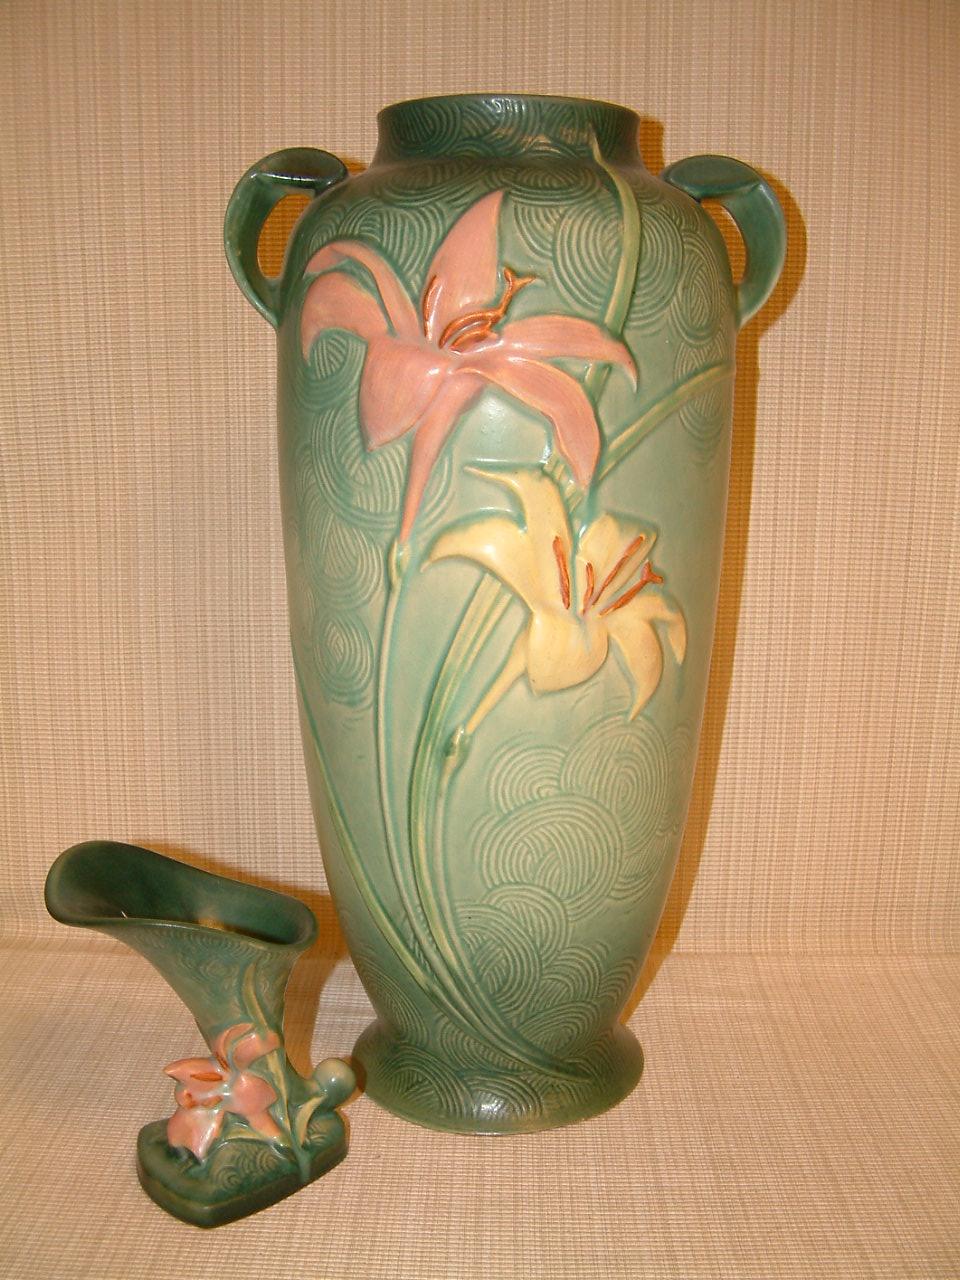 Roseville Zephyr Lily Floor Vase